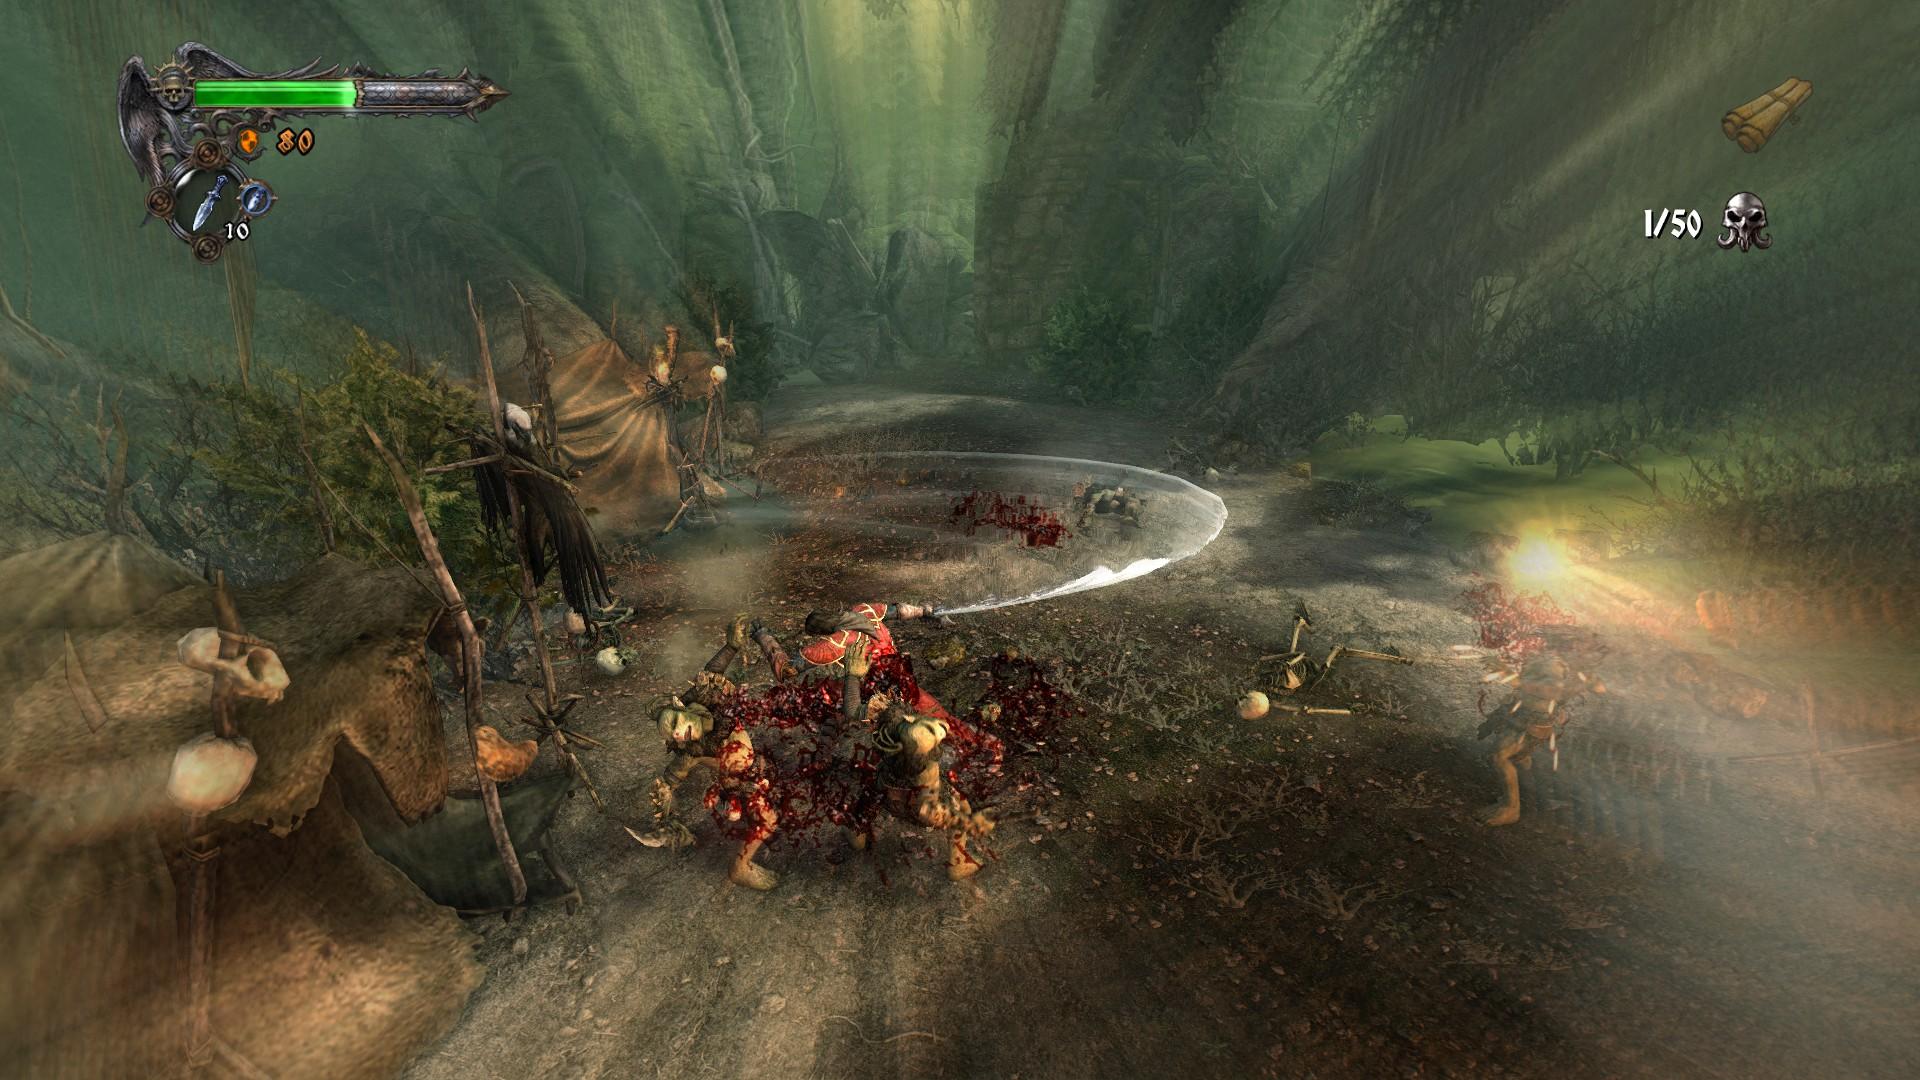 Castlevania-LordsofShadow-UltimateEdition PC Test 001